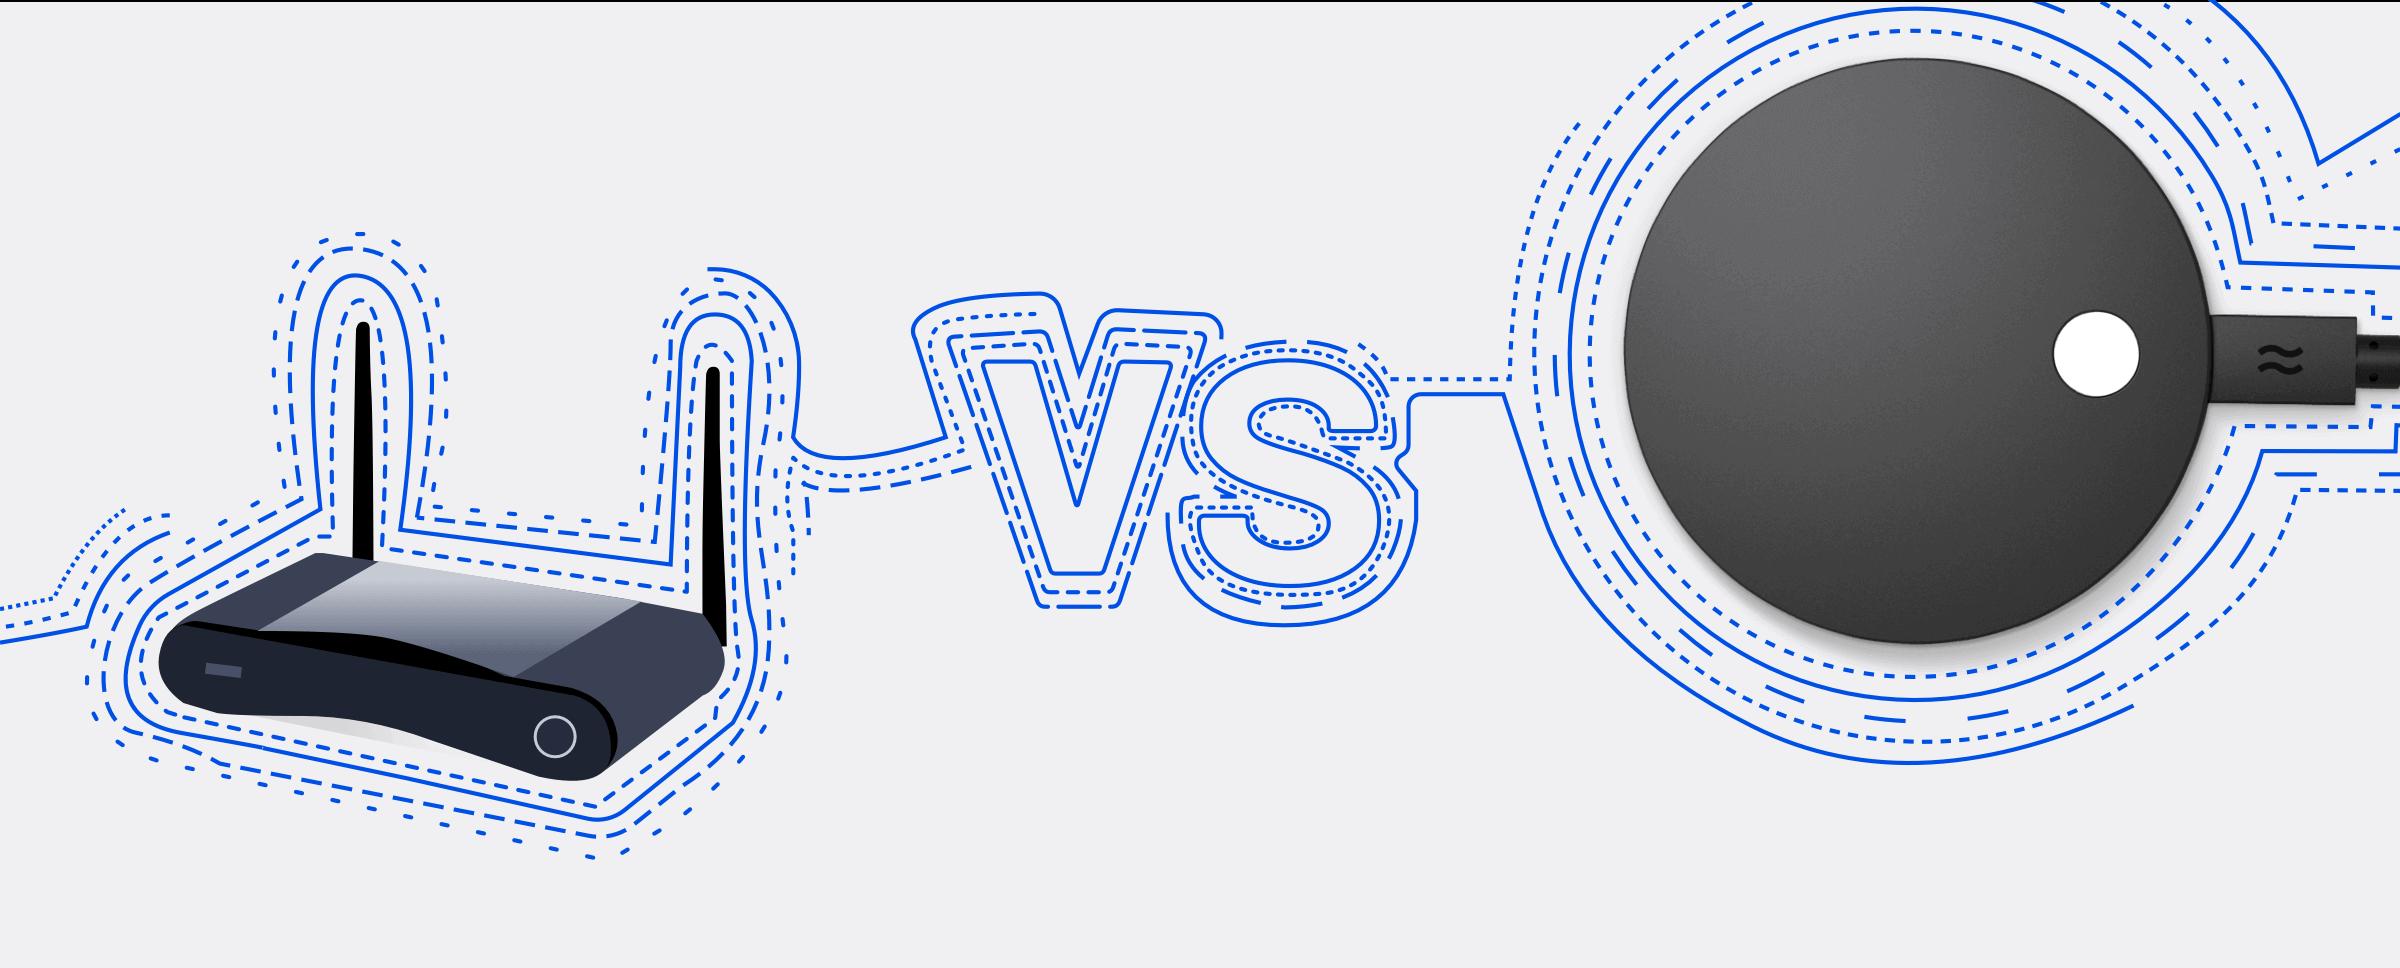 ClickShare vs Airtame 2